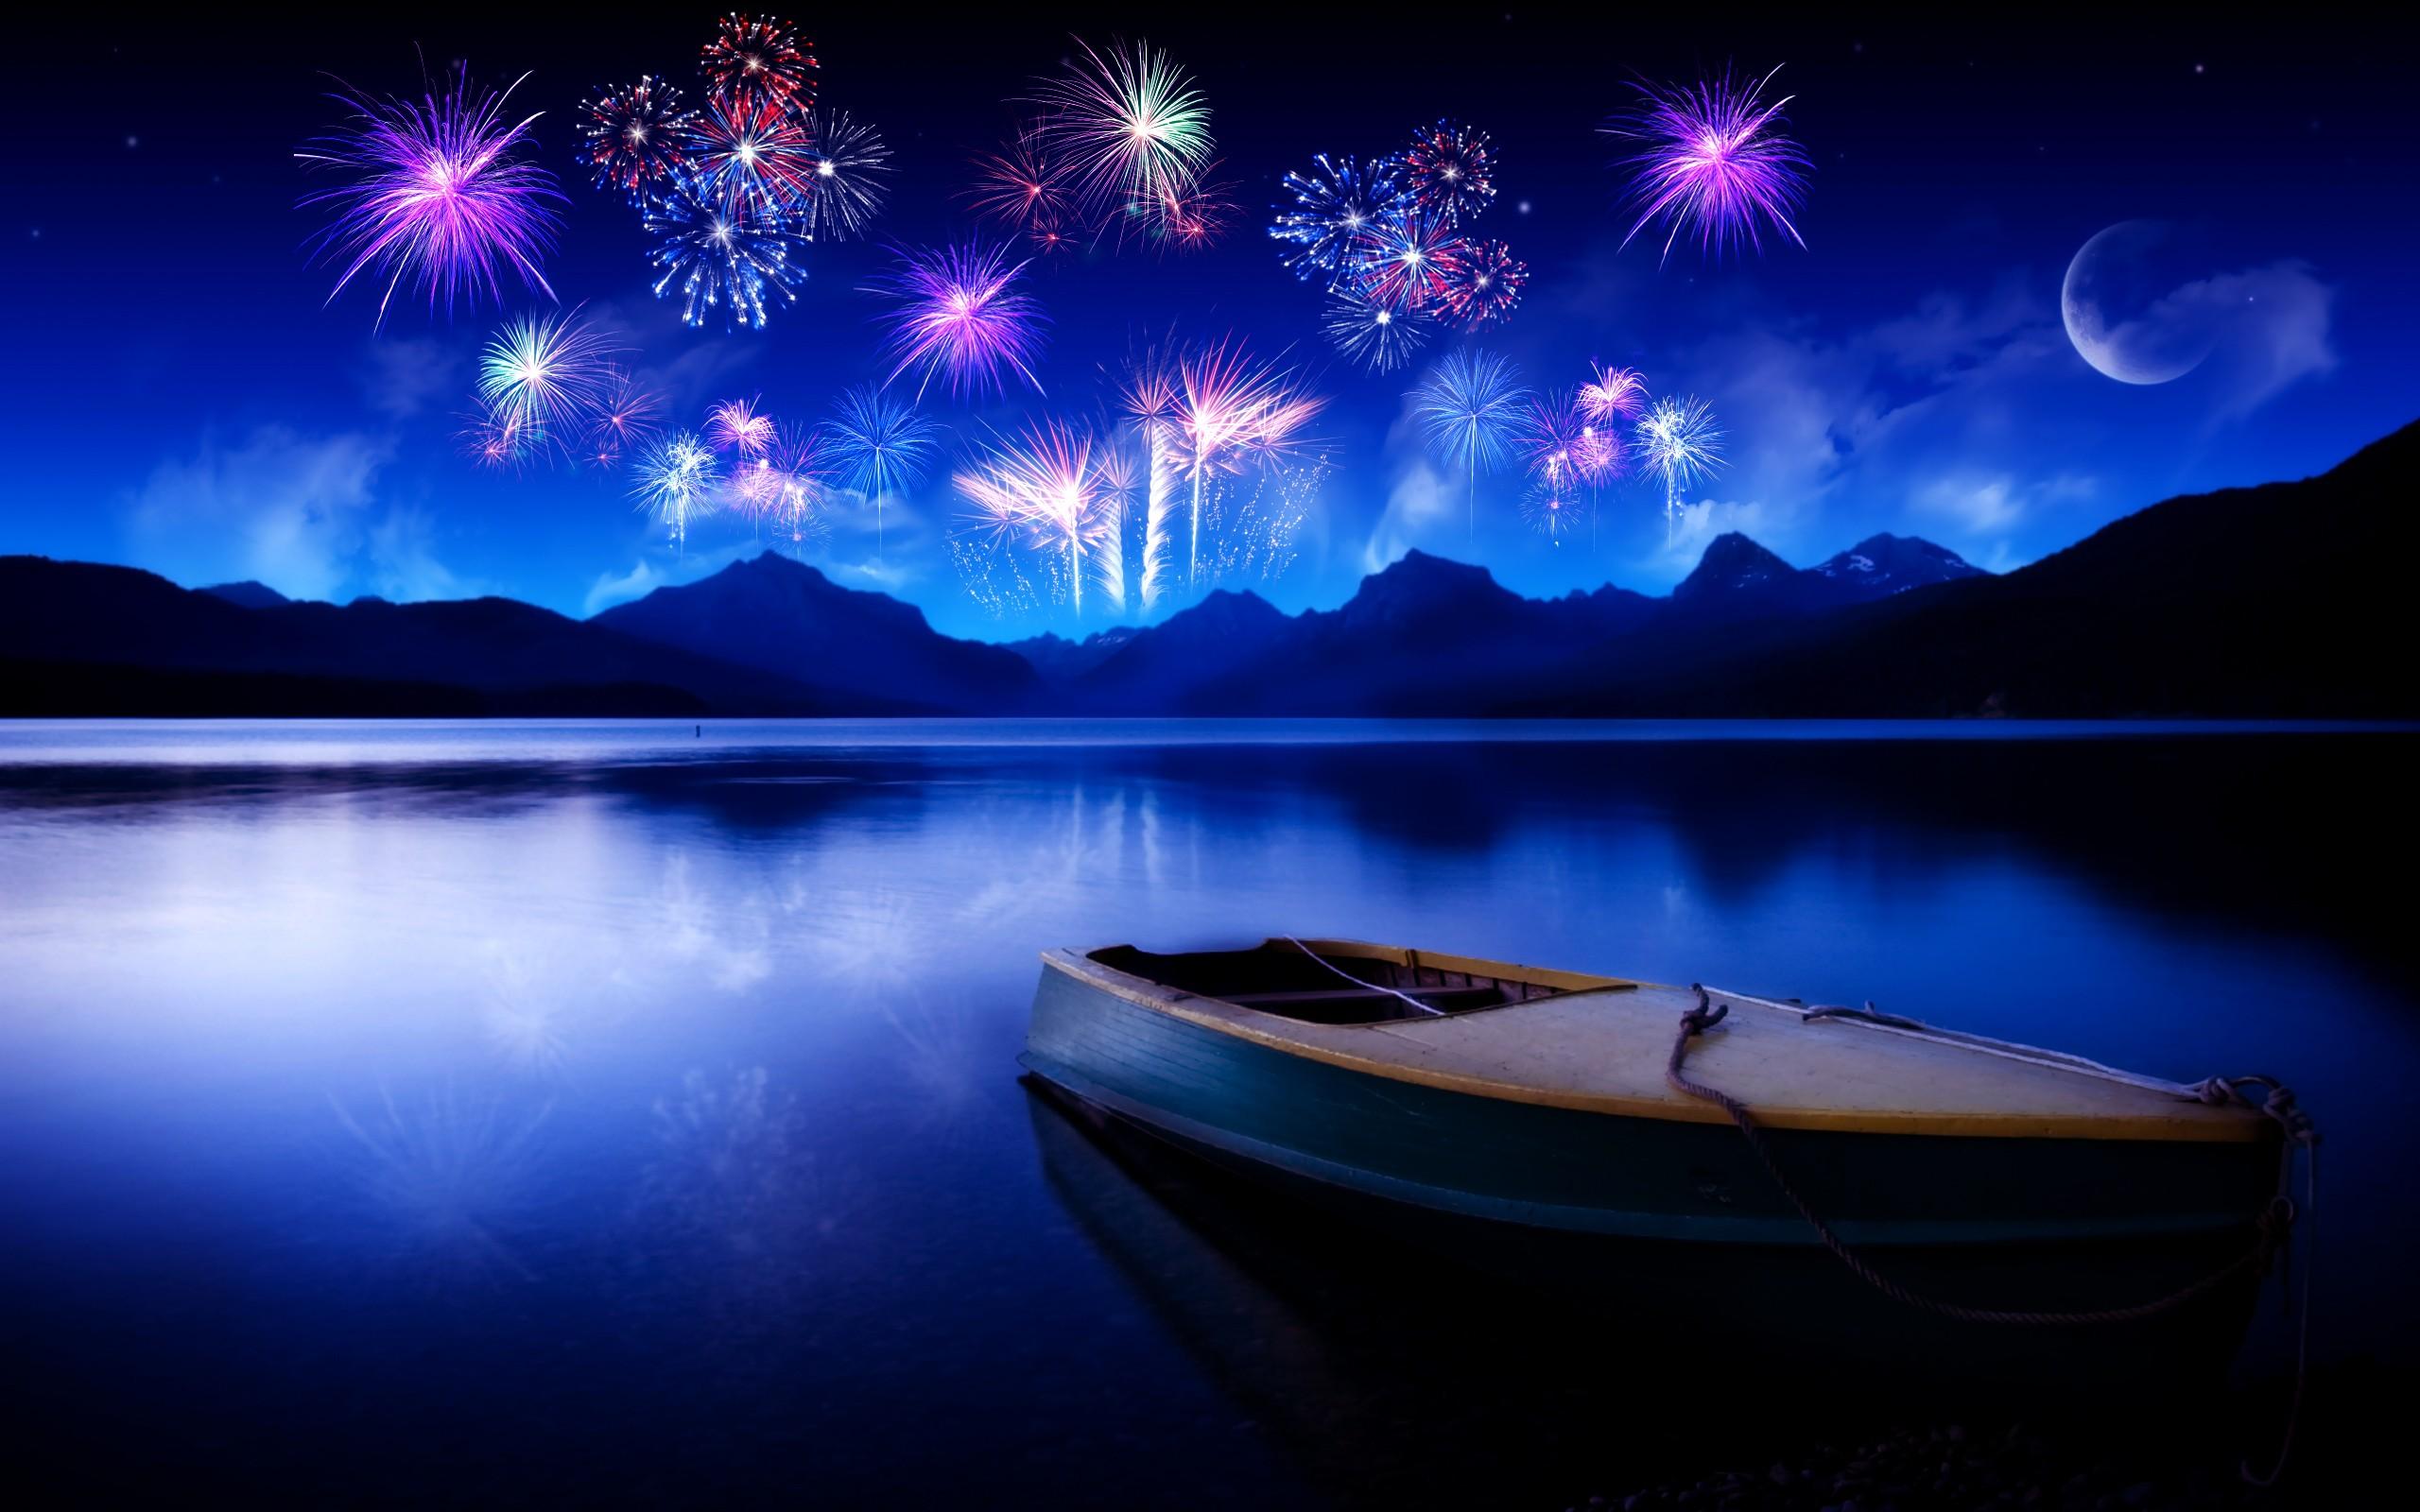 digital art boat night lake reflection fireworks hills moonlight new year screenshot computer wallpaper